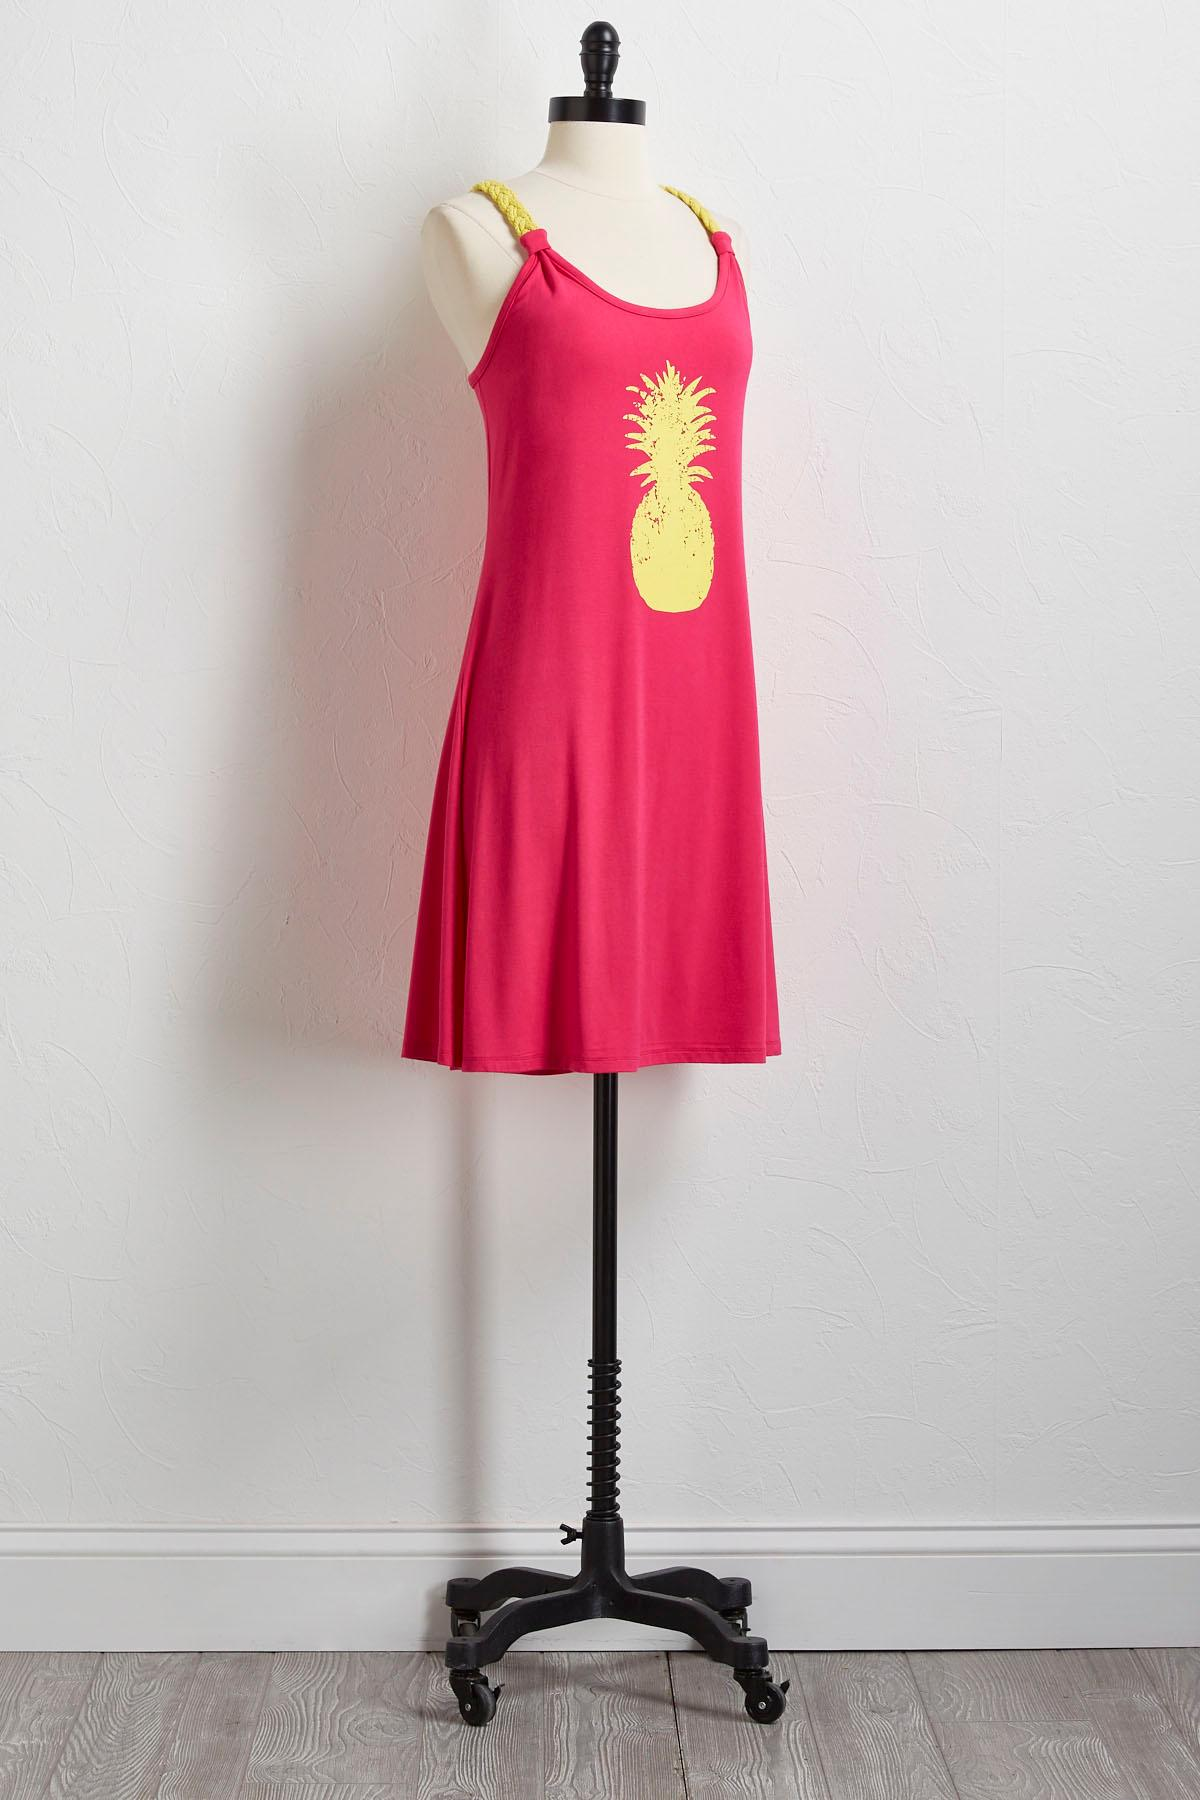 Pineapple Braided Strap Dress